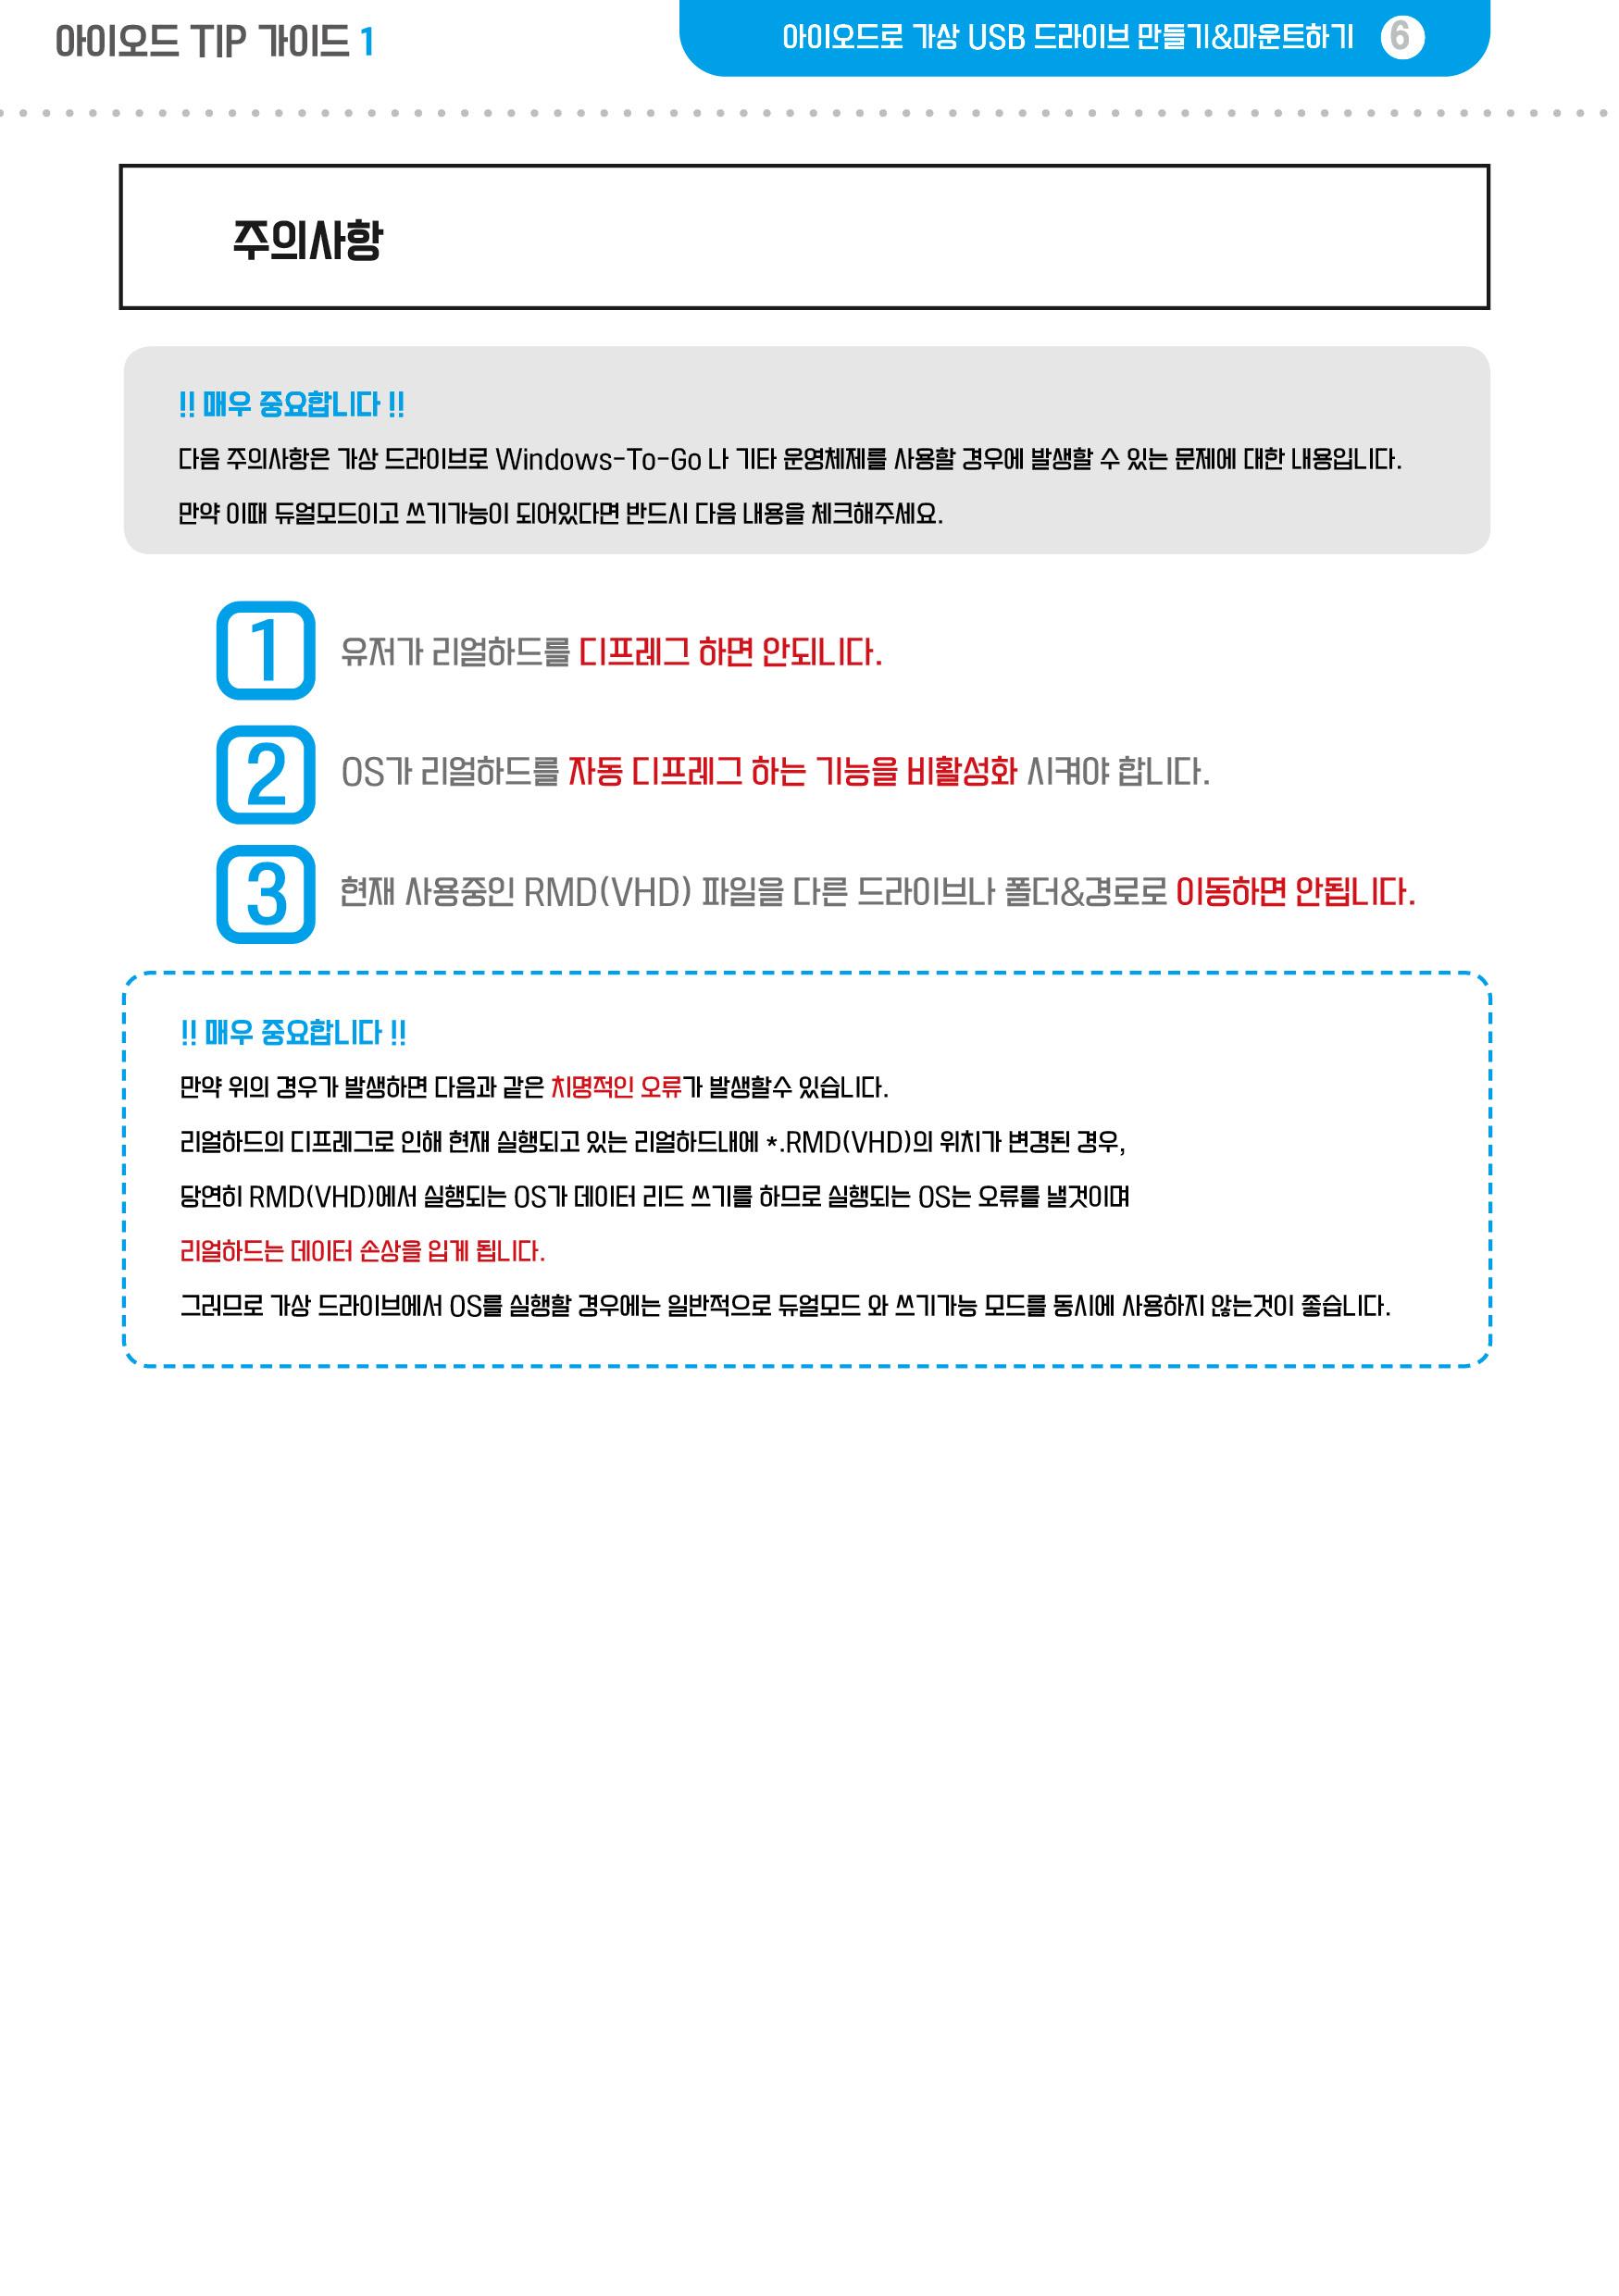 IODD 가상 USB 메모리 가이드6